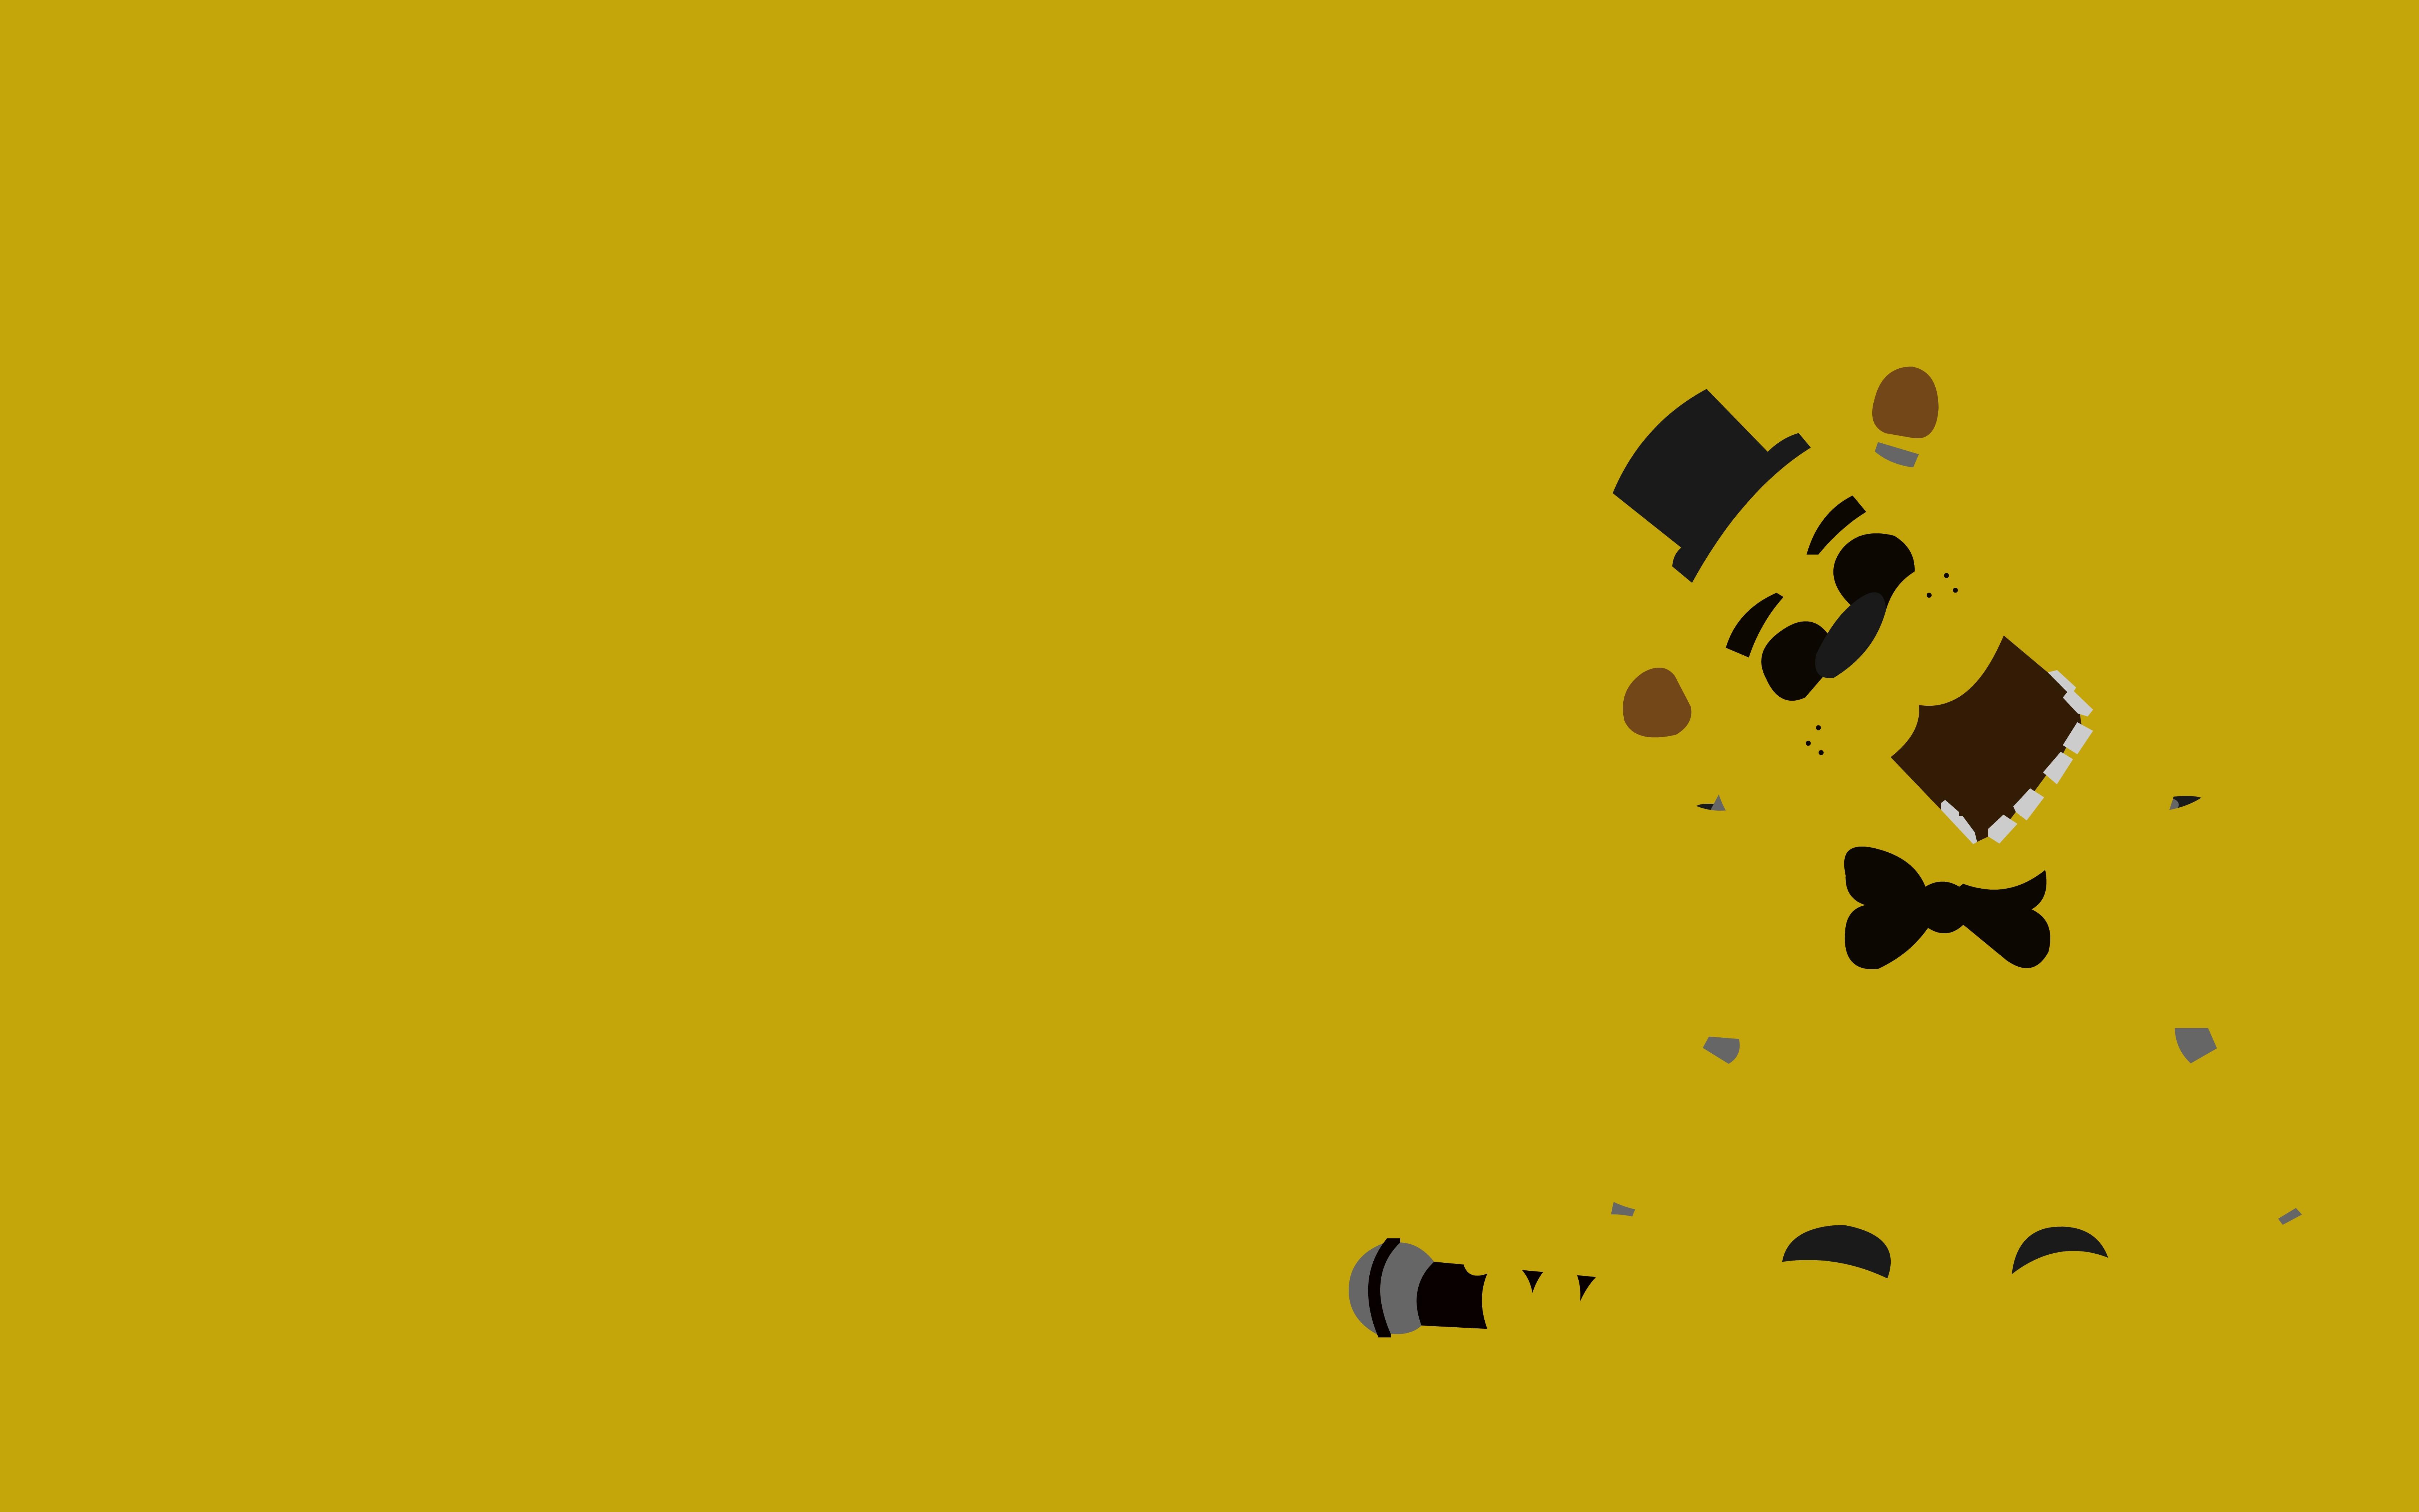 Golden Freddy By Dragonitearmy On Deviantart